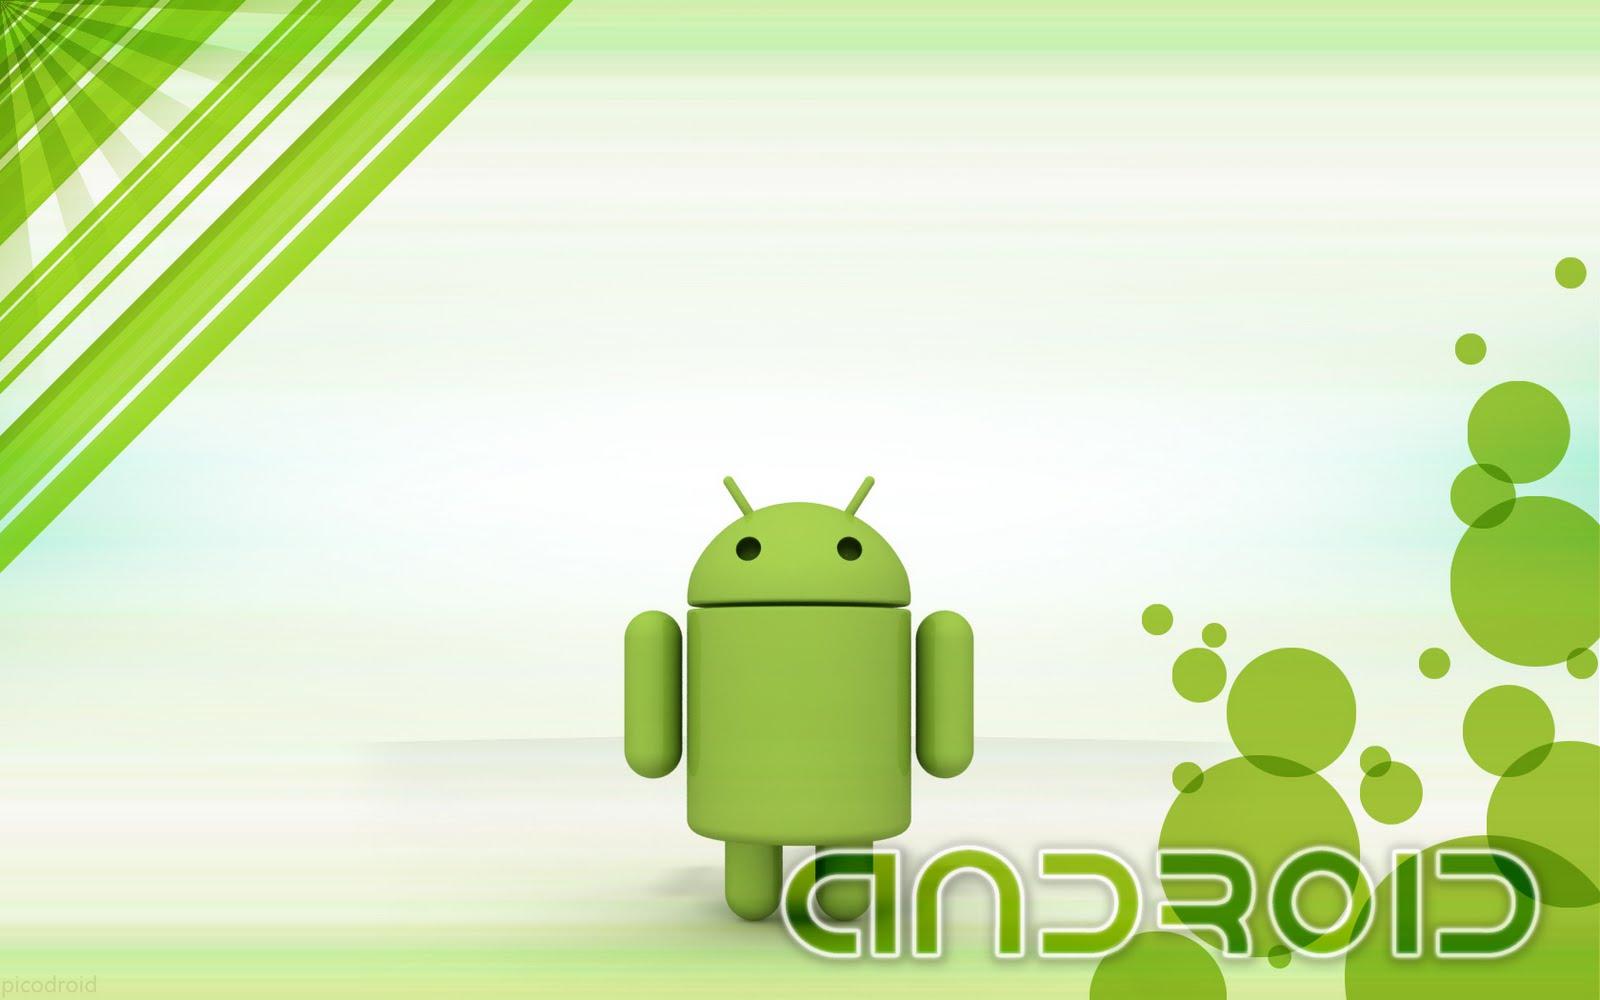 http://2.bp.blogspot.com/-M6kEavsWAys/TkDx7DG0CGI/AAAAAAAAAEs/N59P0fvmG4Y/s1600/Android-Wallpaper.jpg